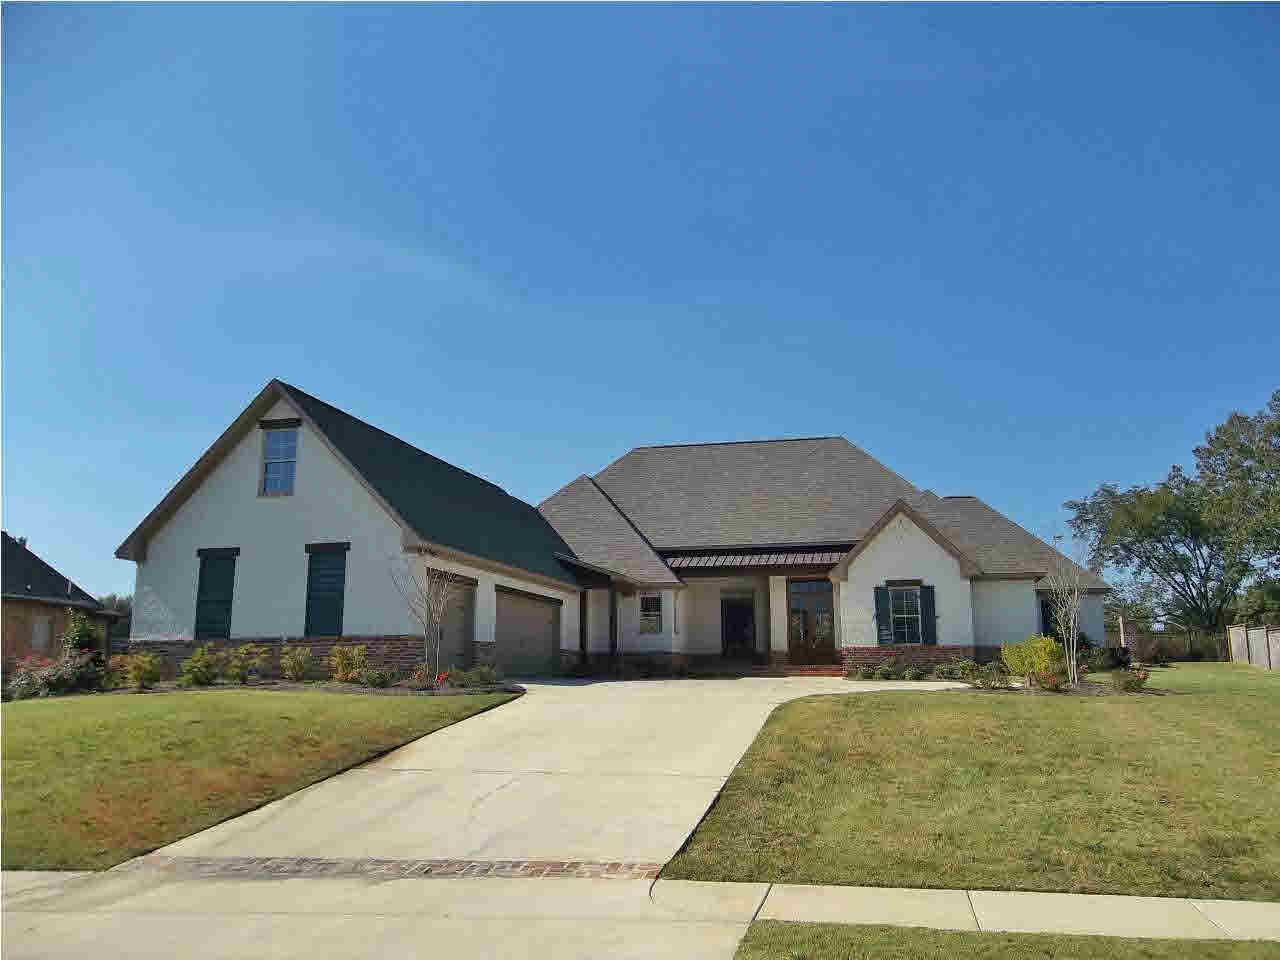 Real Estate for Sale, ListingId: 30456657, Madison,MS39110